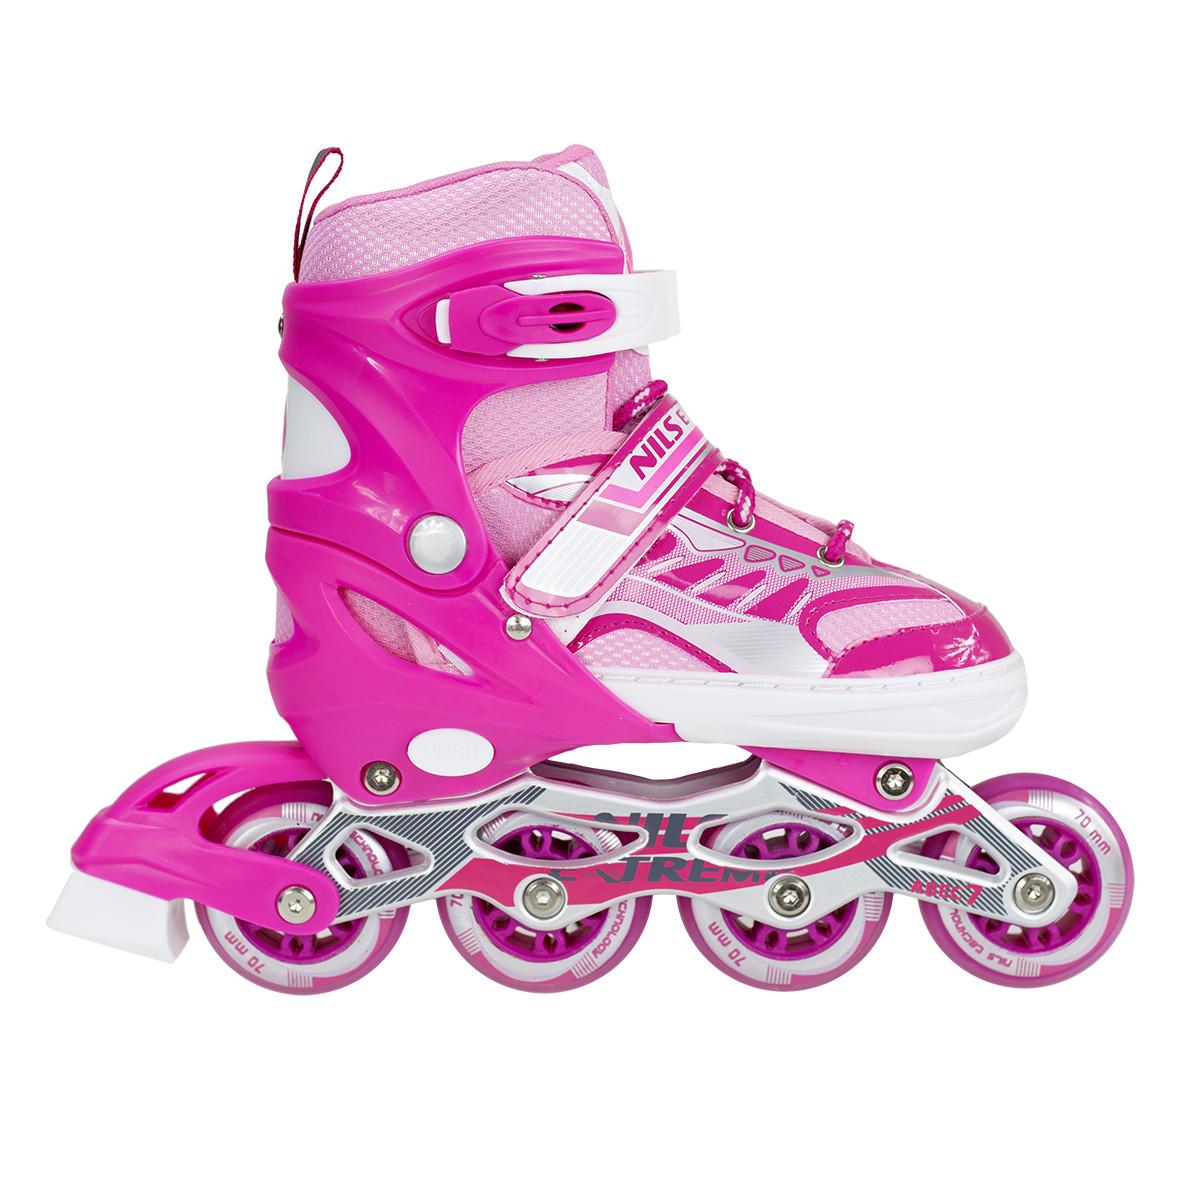 Роликові ковзани Nils Extreme NJ1828A Size 39-42 Pink